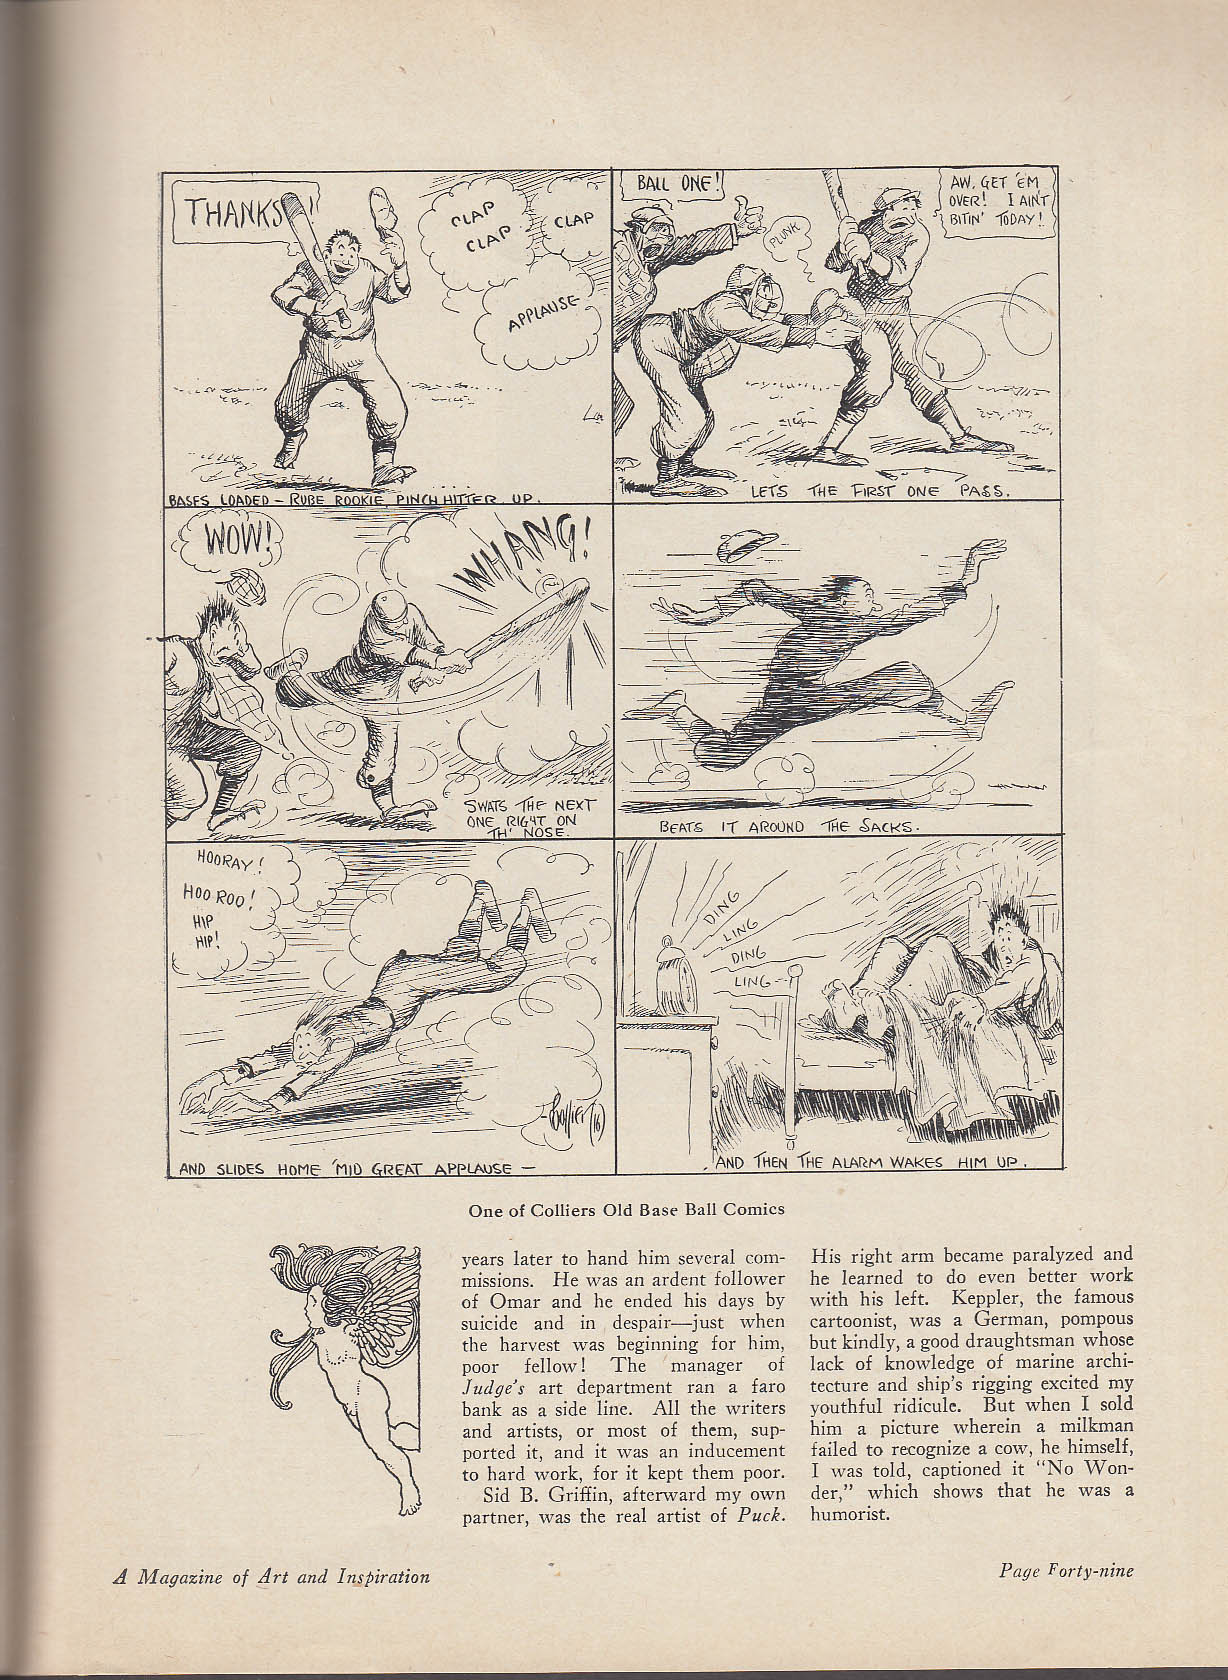 ART & LIFE 6 1925 cartooning; studio photography, nature